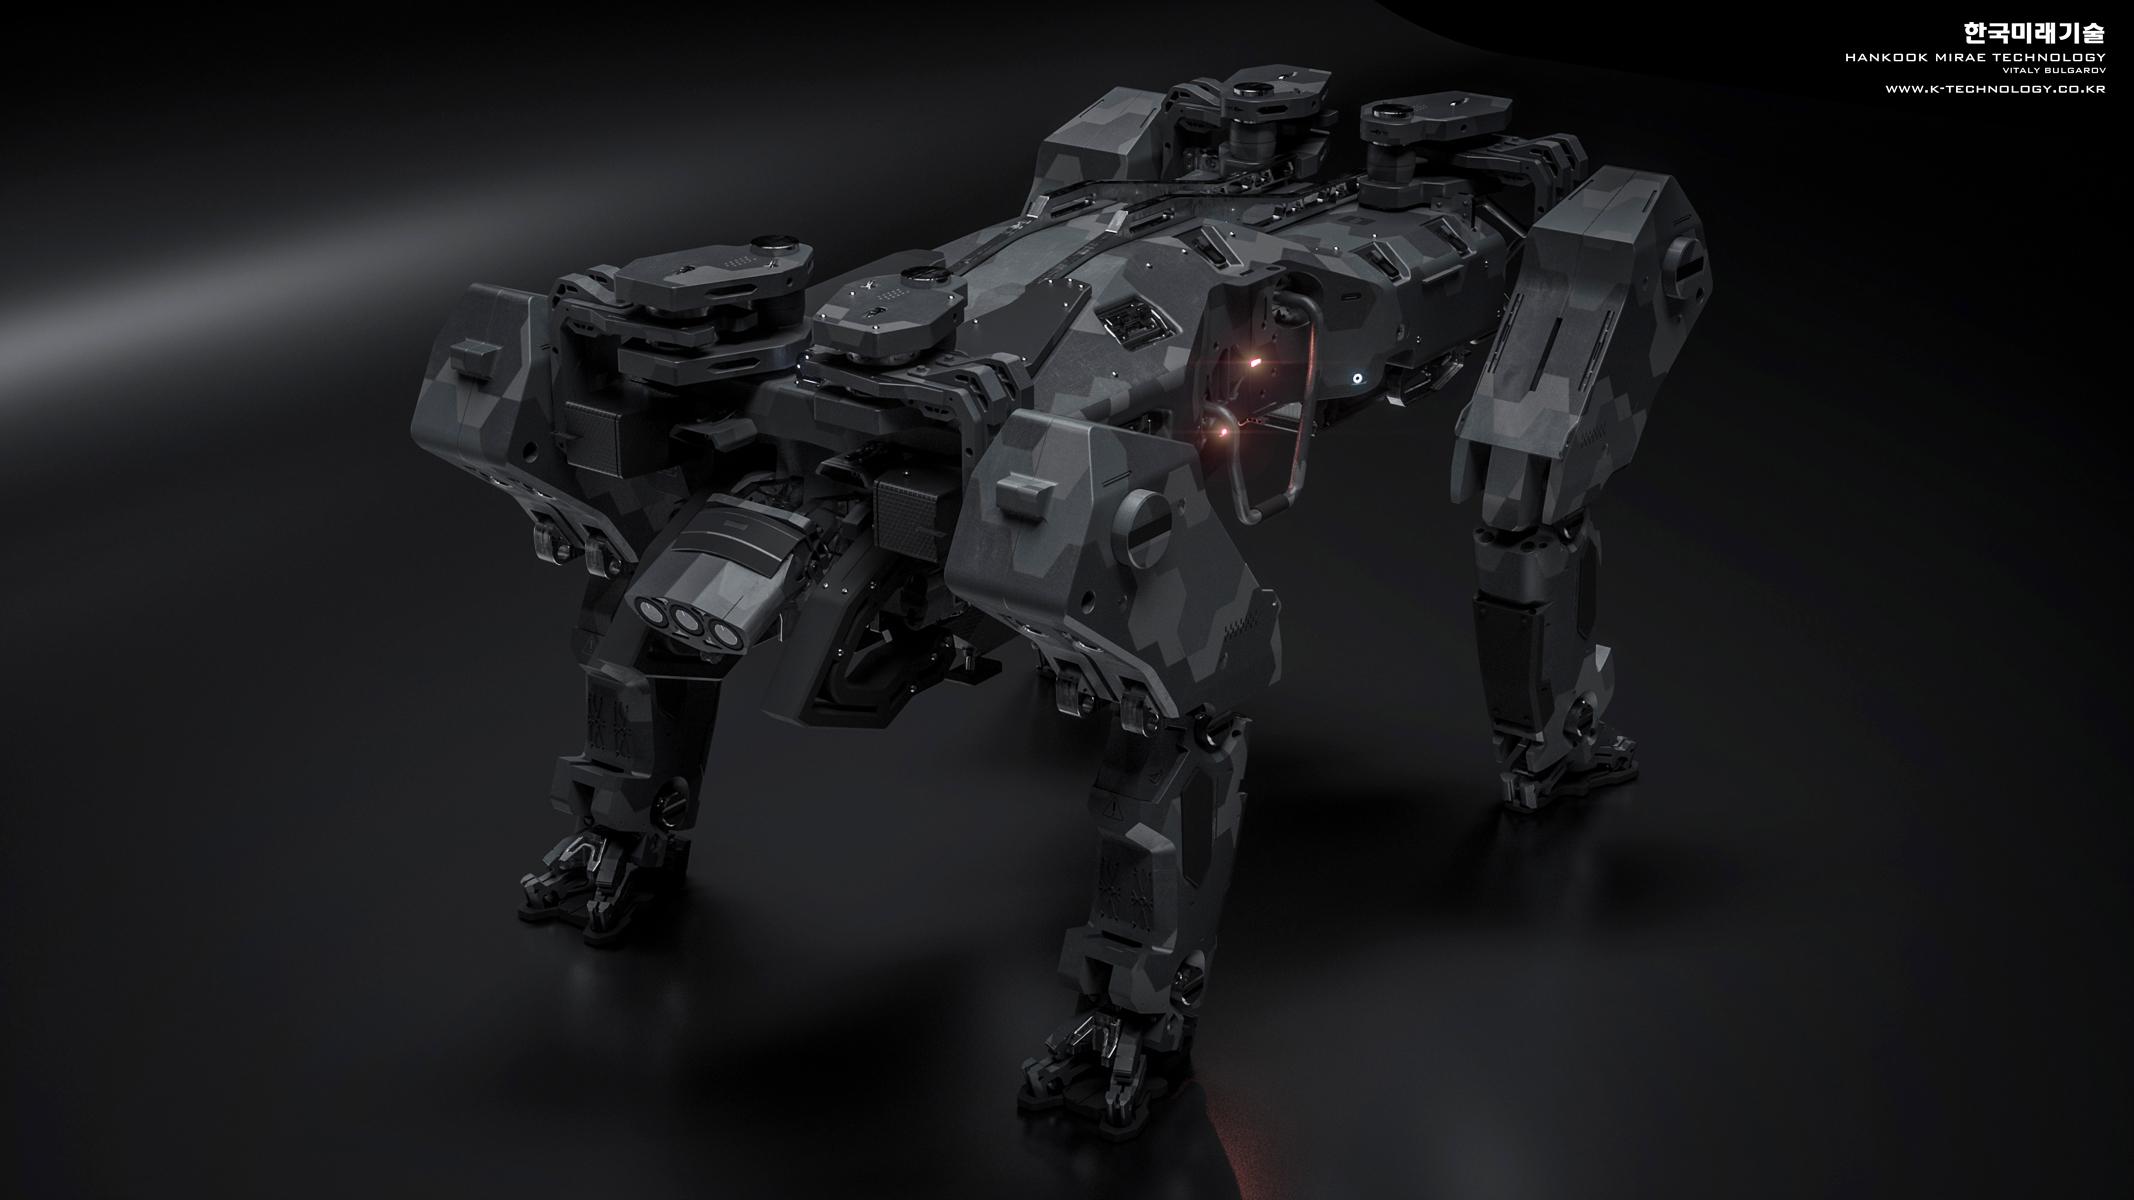 KFT_4LeggedRobot_FullView_DarkCamo_07.jpg